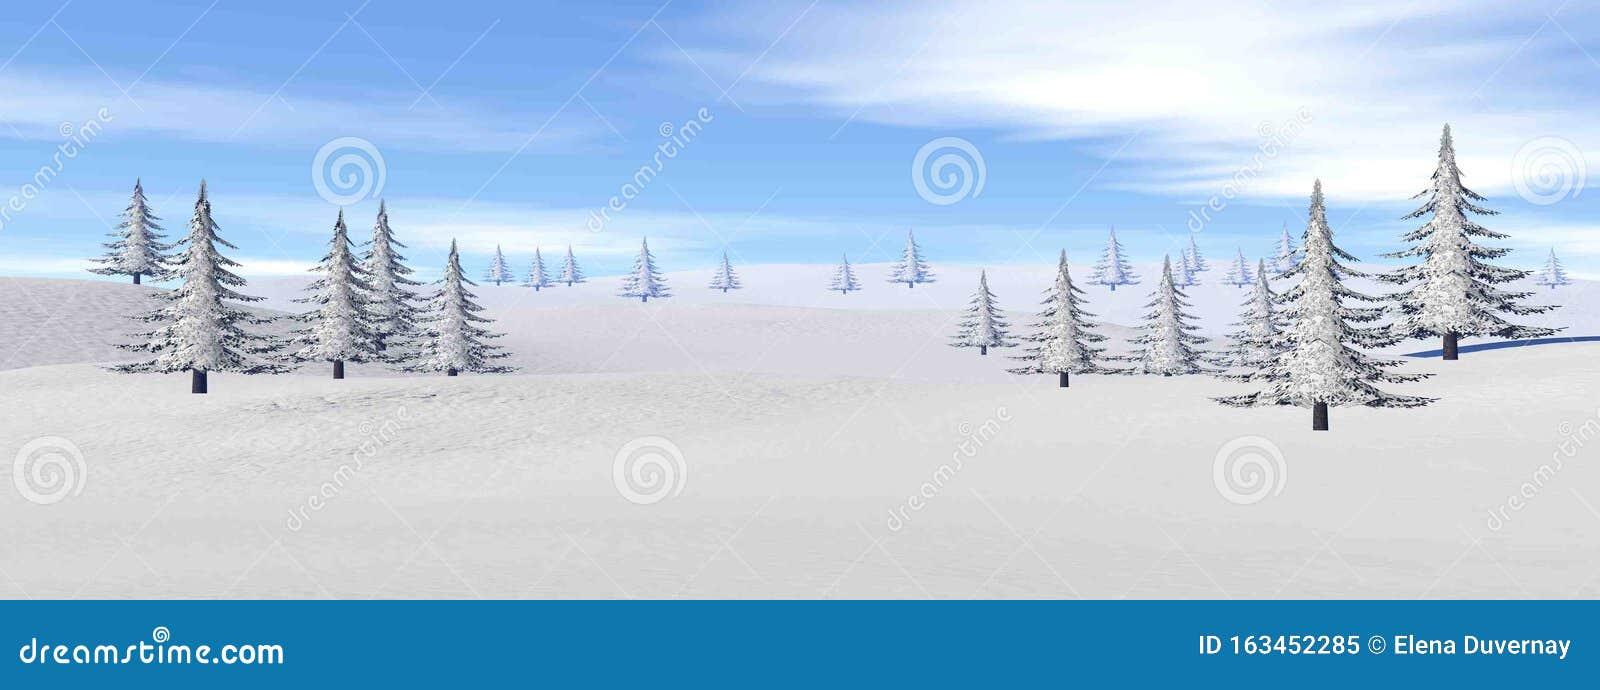 Winter landscape in the mountain - 3D render